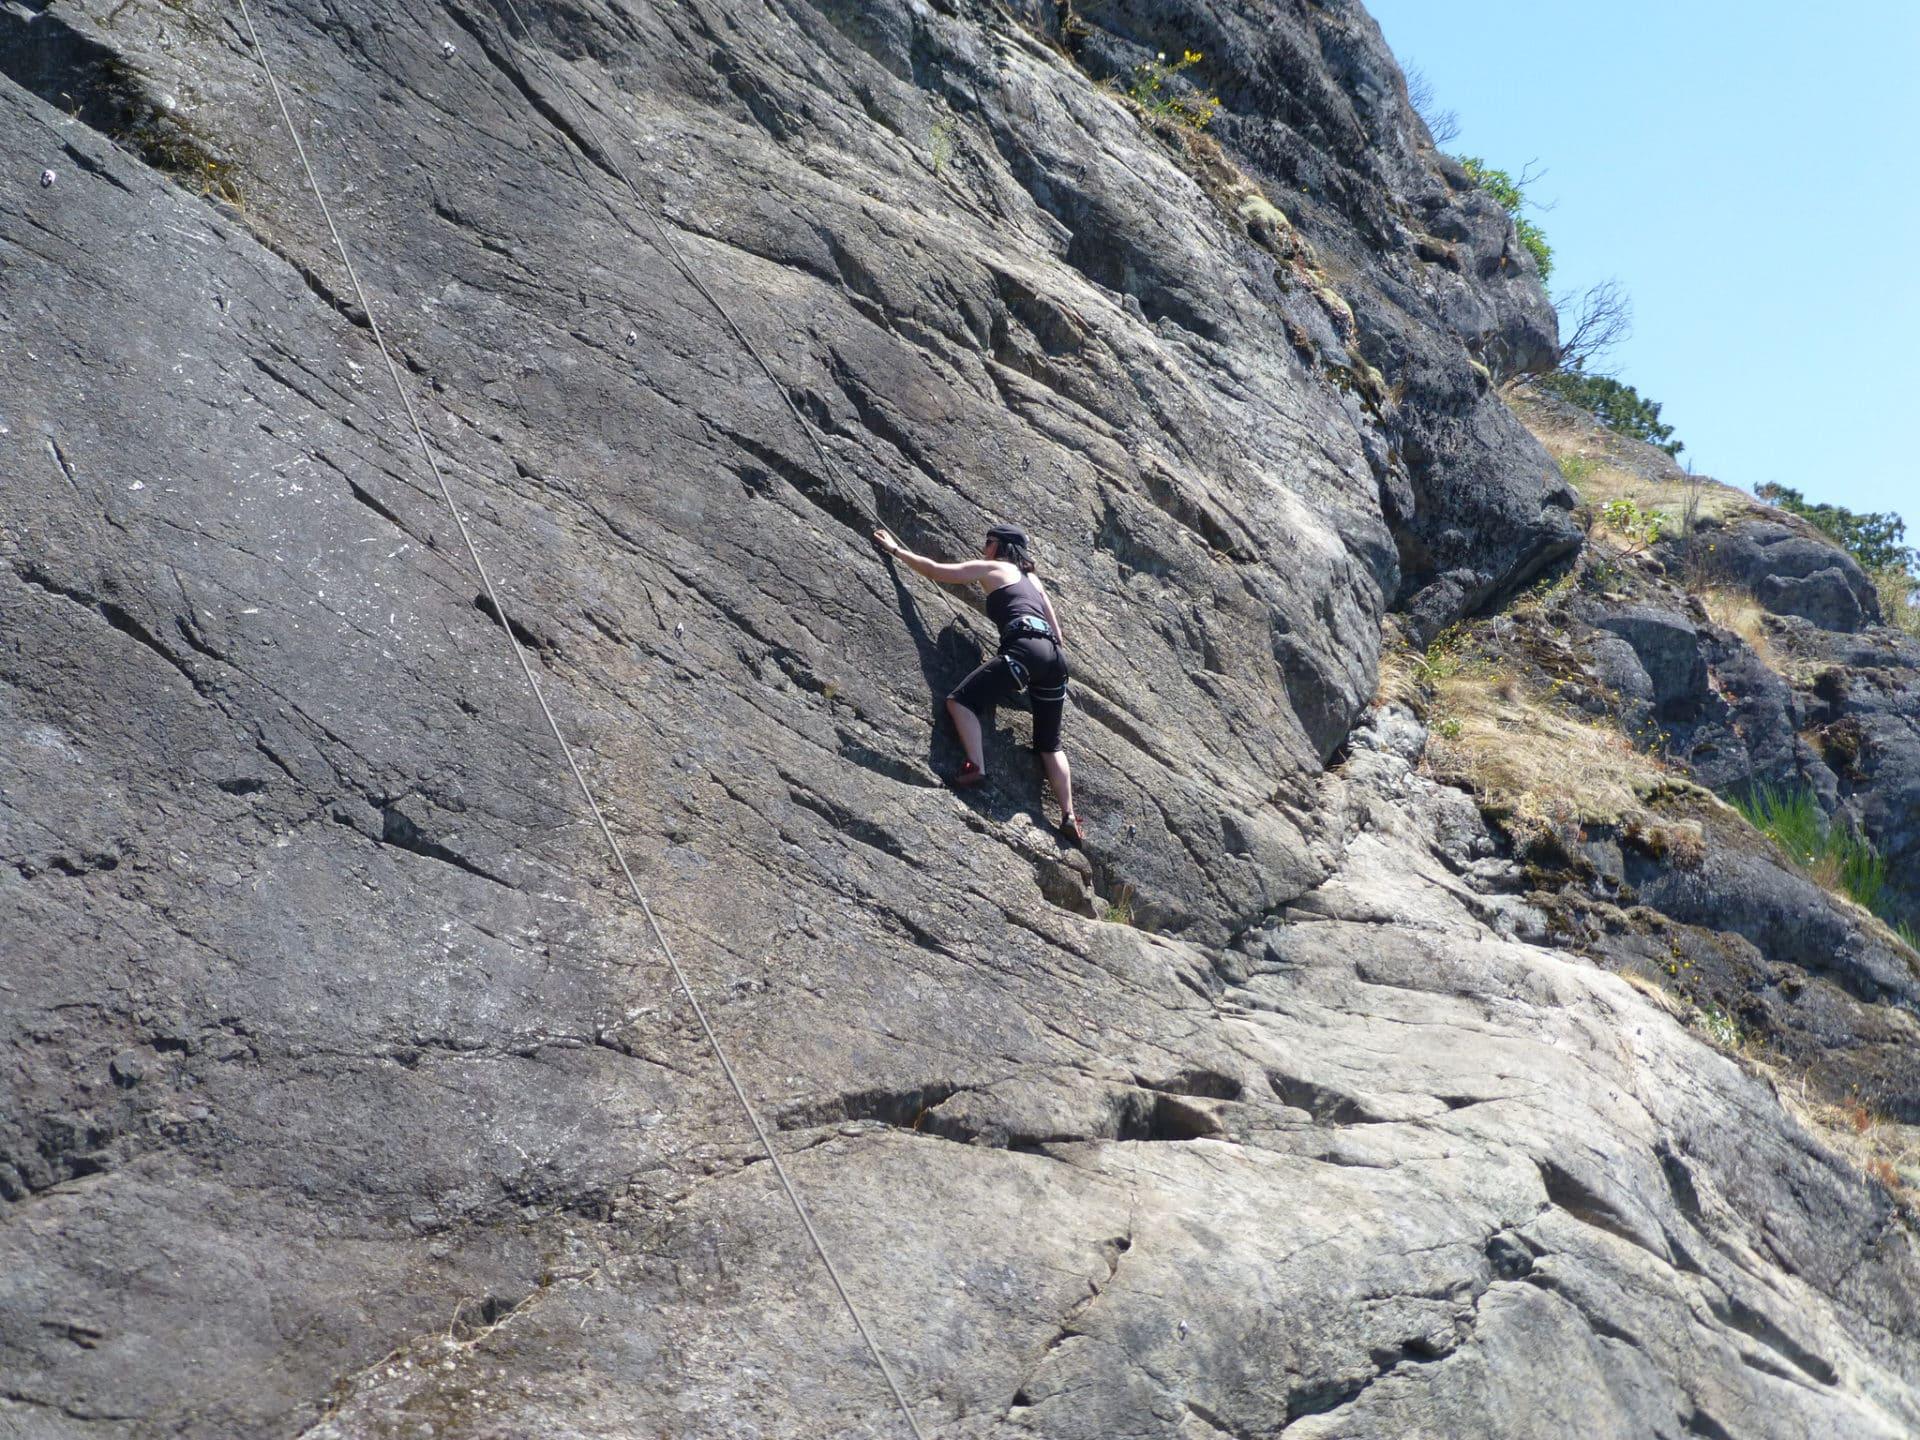 Rock climbing on the Pilastro Lomasti, Aosta Valley